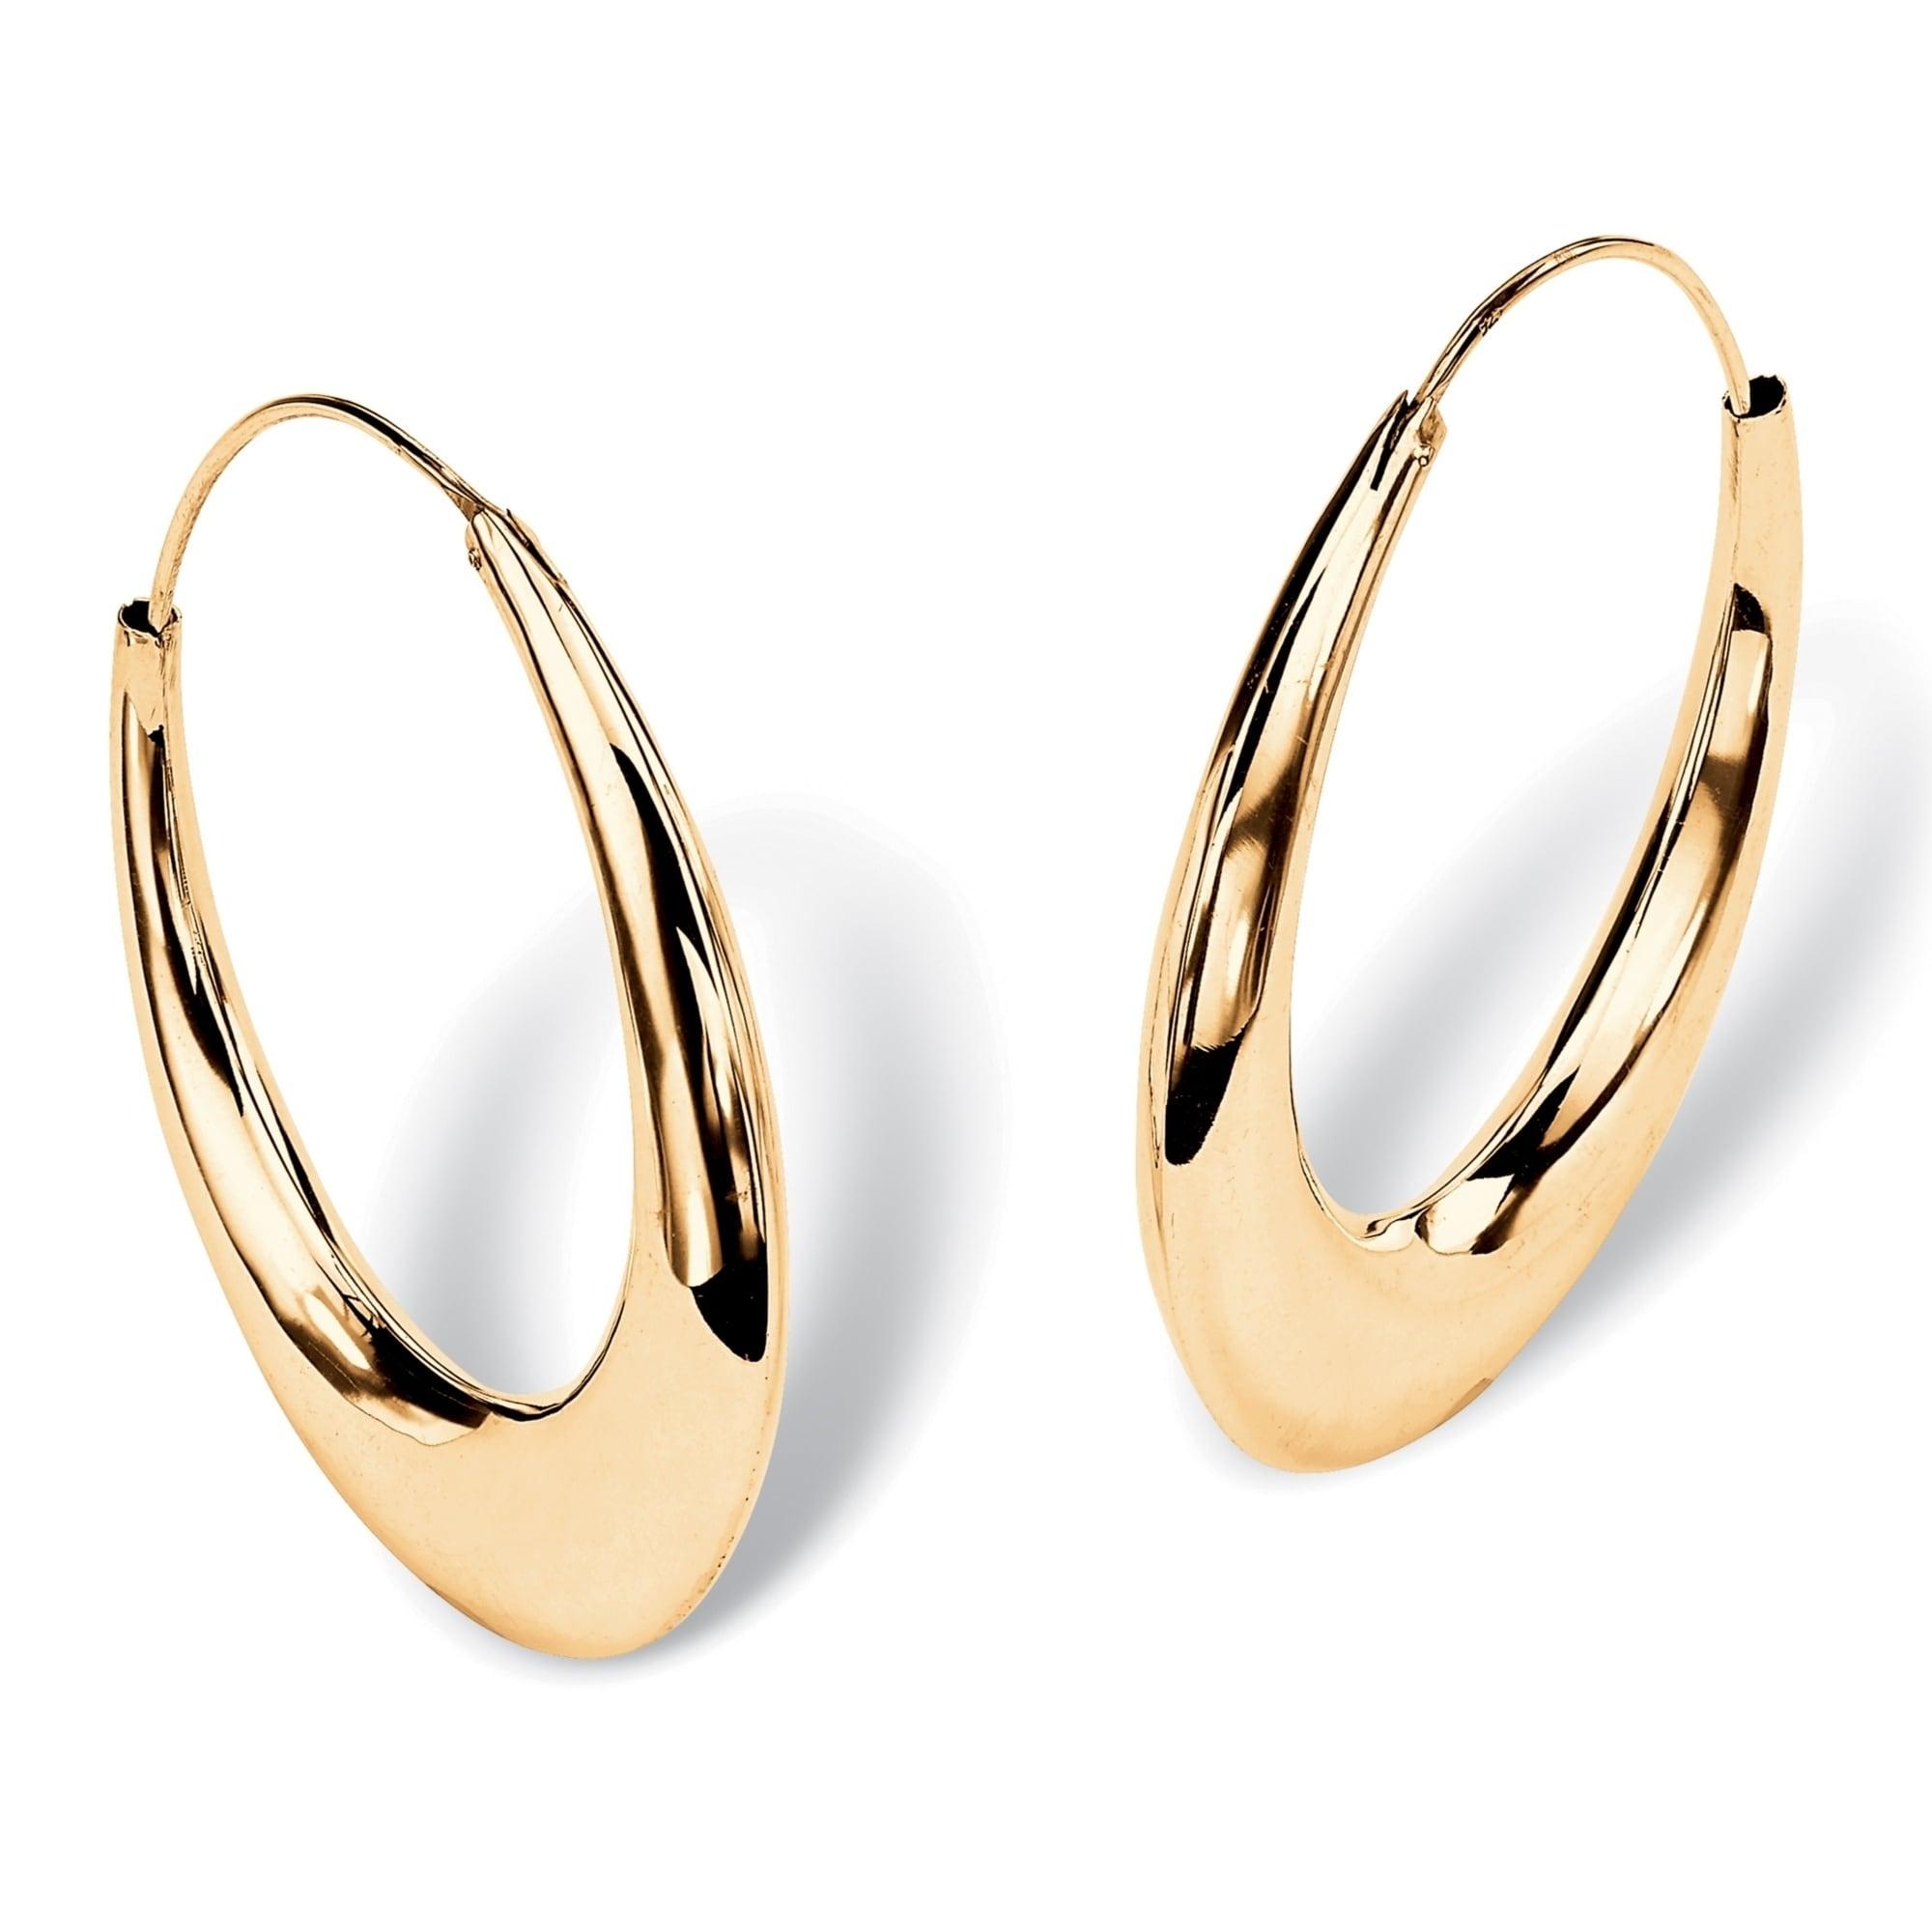 14K Yellow Gold 3mm Two Row Prongs Simulated Diamond Huggie Hoop Earrings Hinged